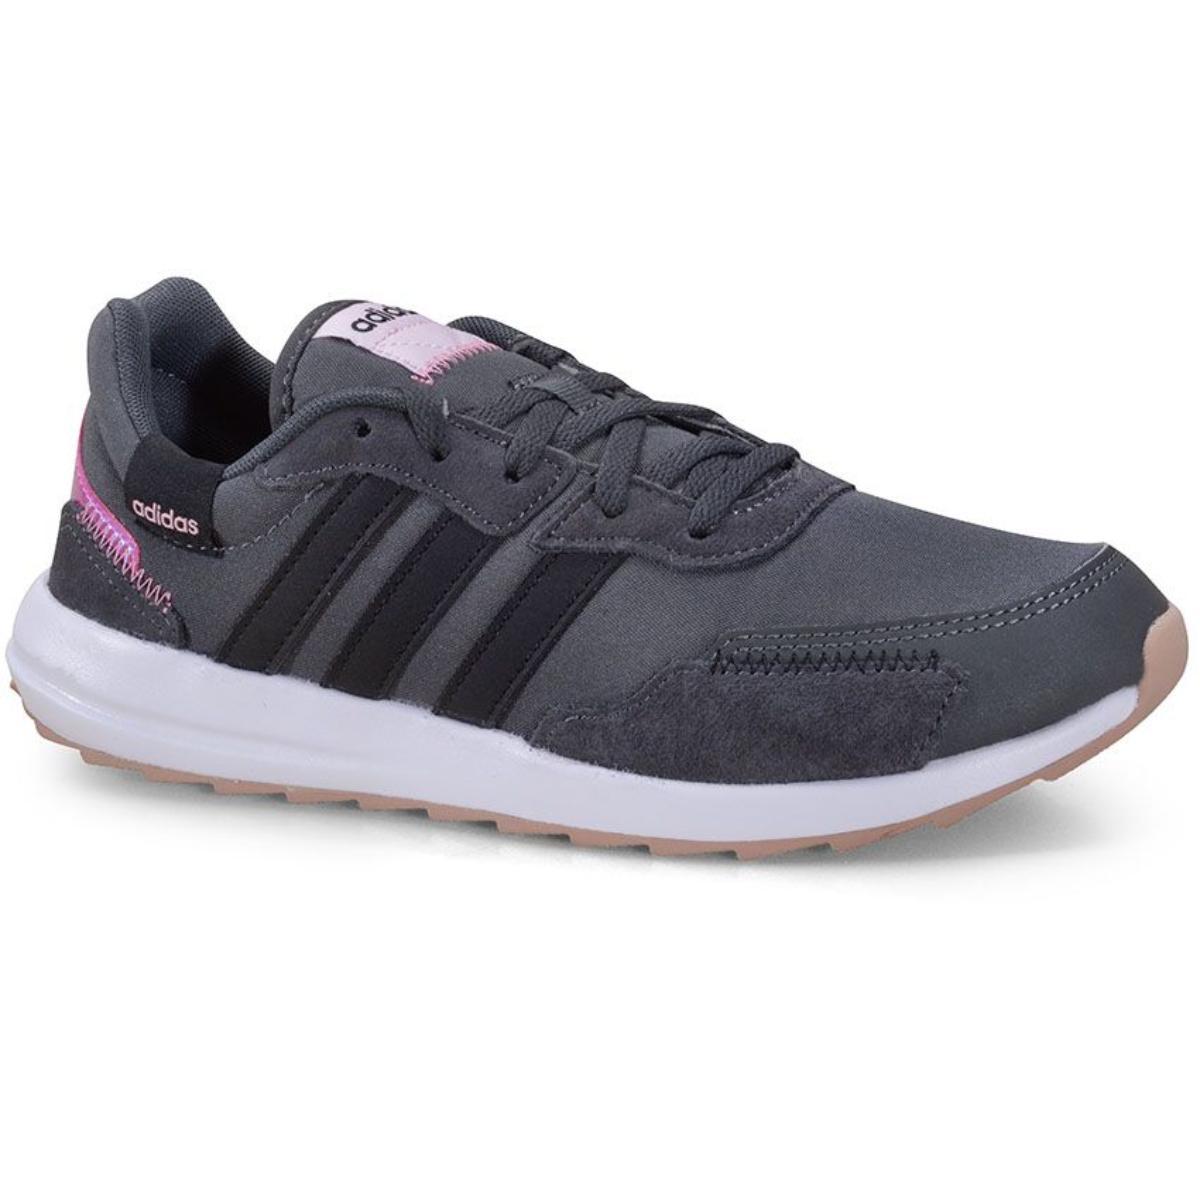 Tênis Feminino Adidas Fy8417 Retrôrun Grafite/rosa